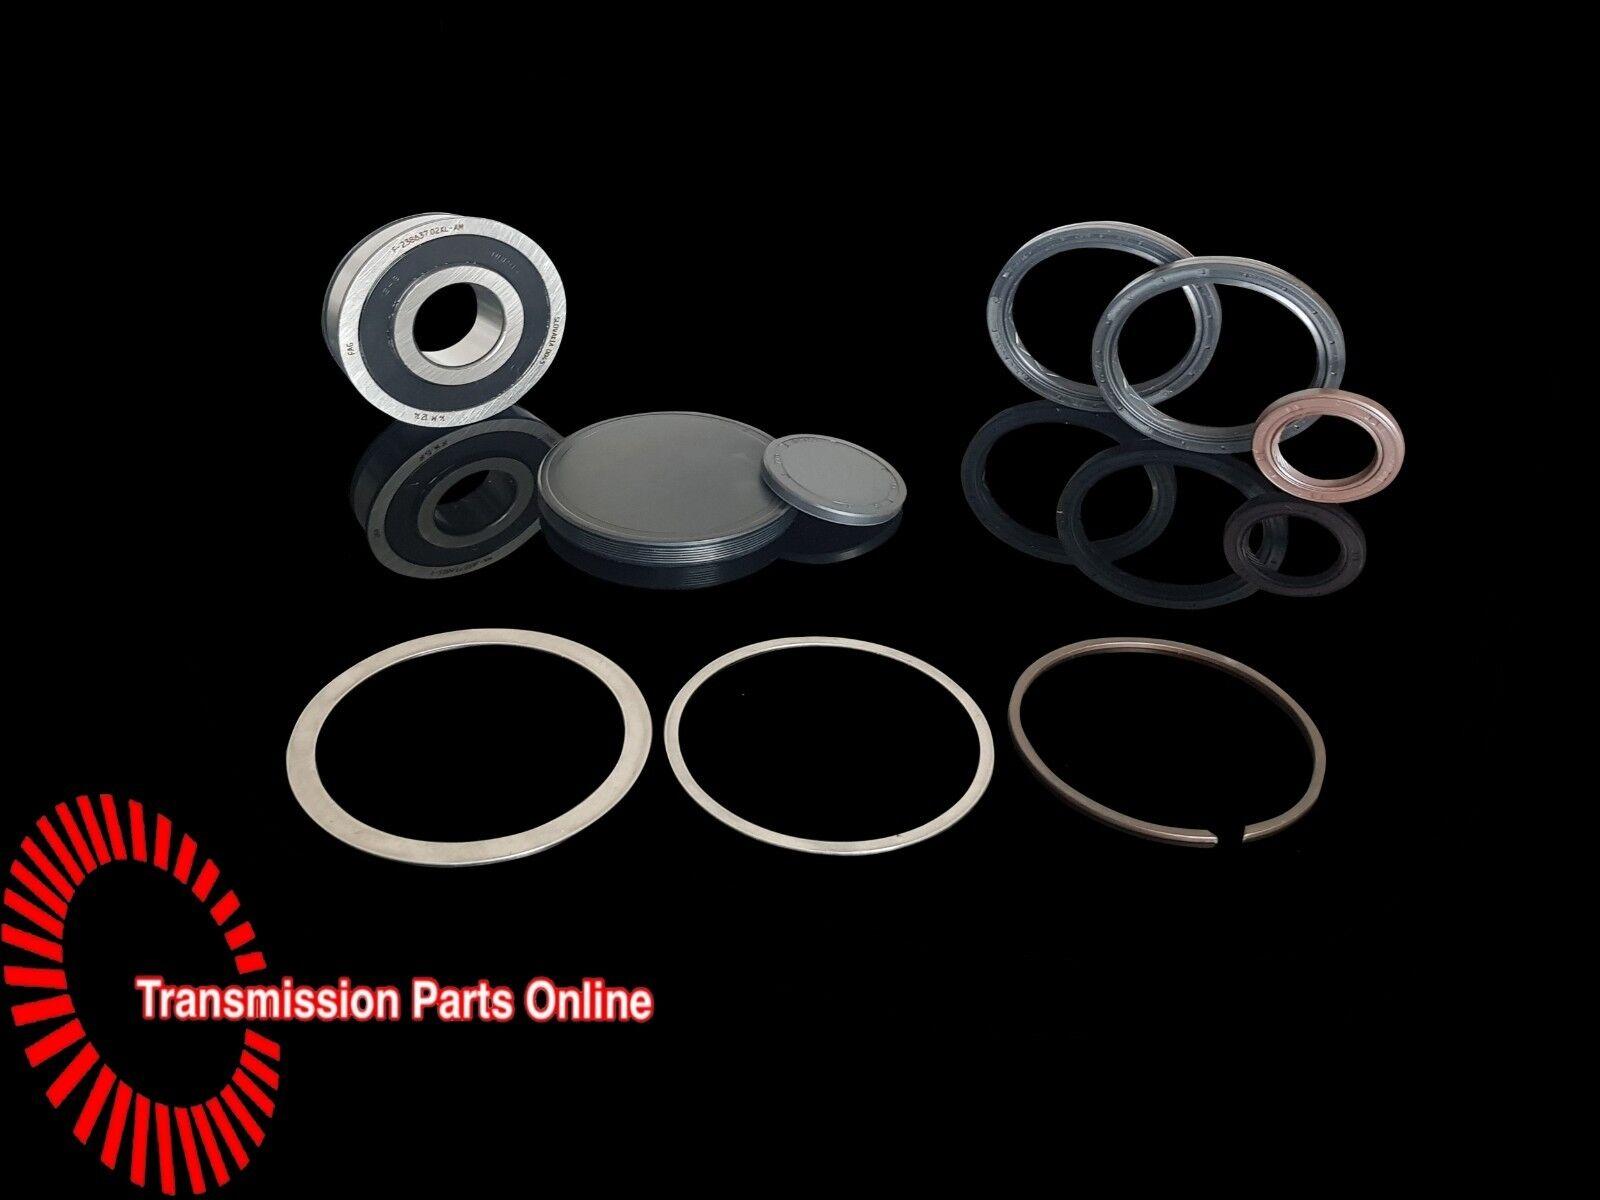 Details about Audi A3 2 0 Petrol / TDi 02Q 6 Speed Gearbox Top Bearing &  Oil Seal Repair Kit